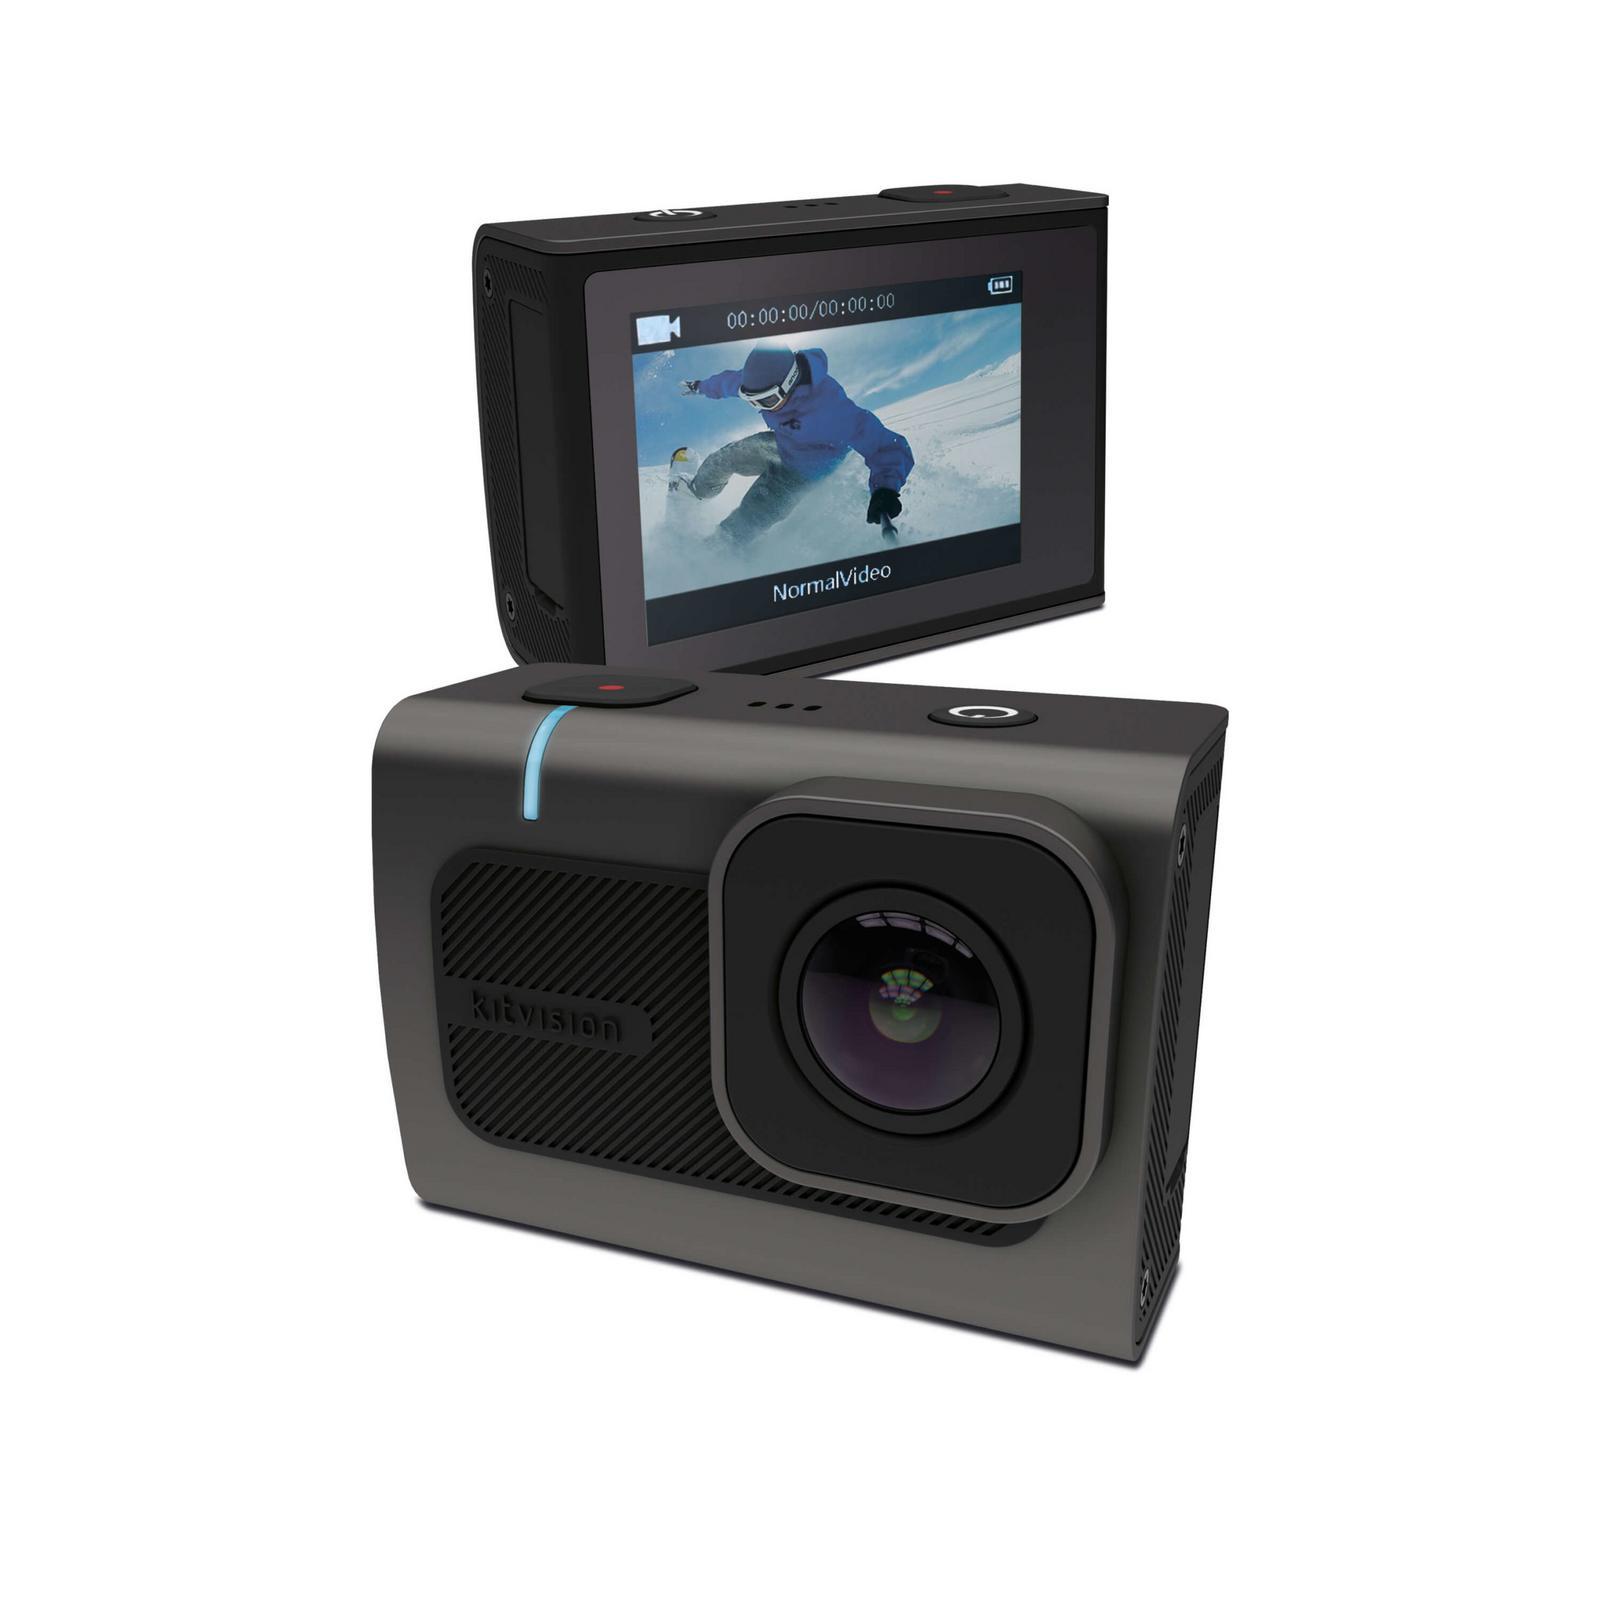 kitvision venture 1080p action camera